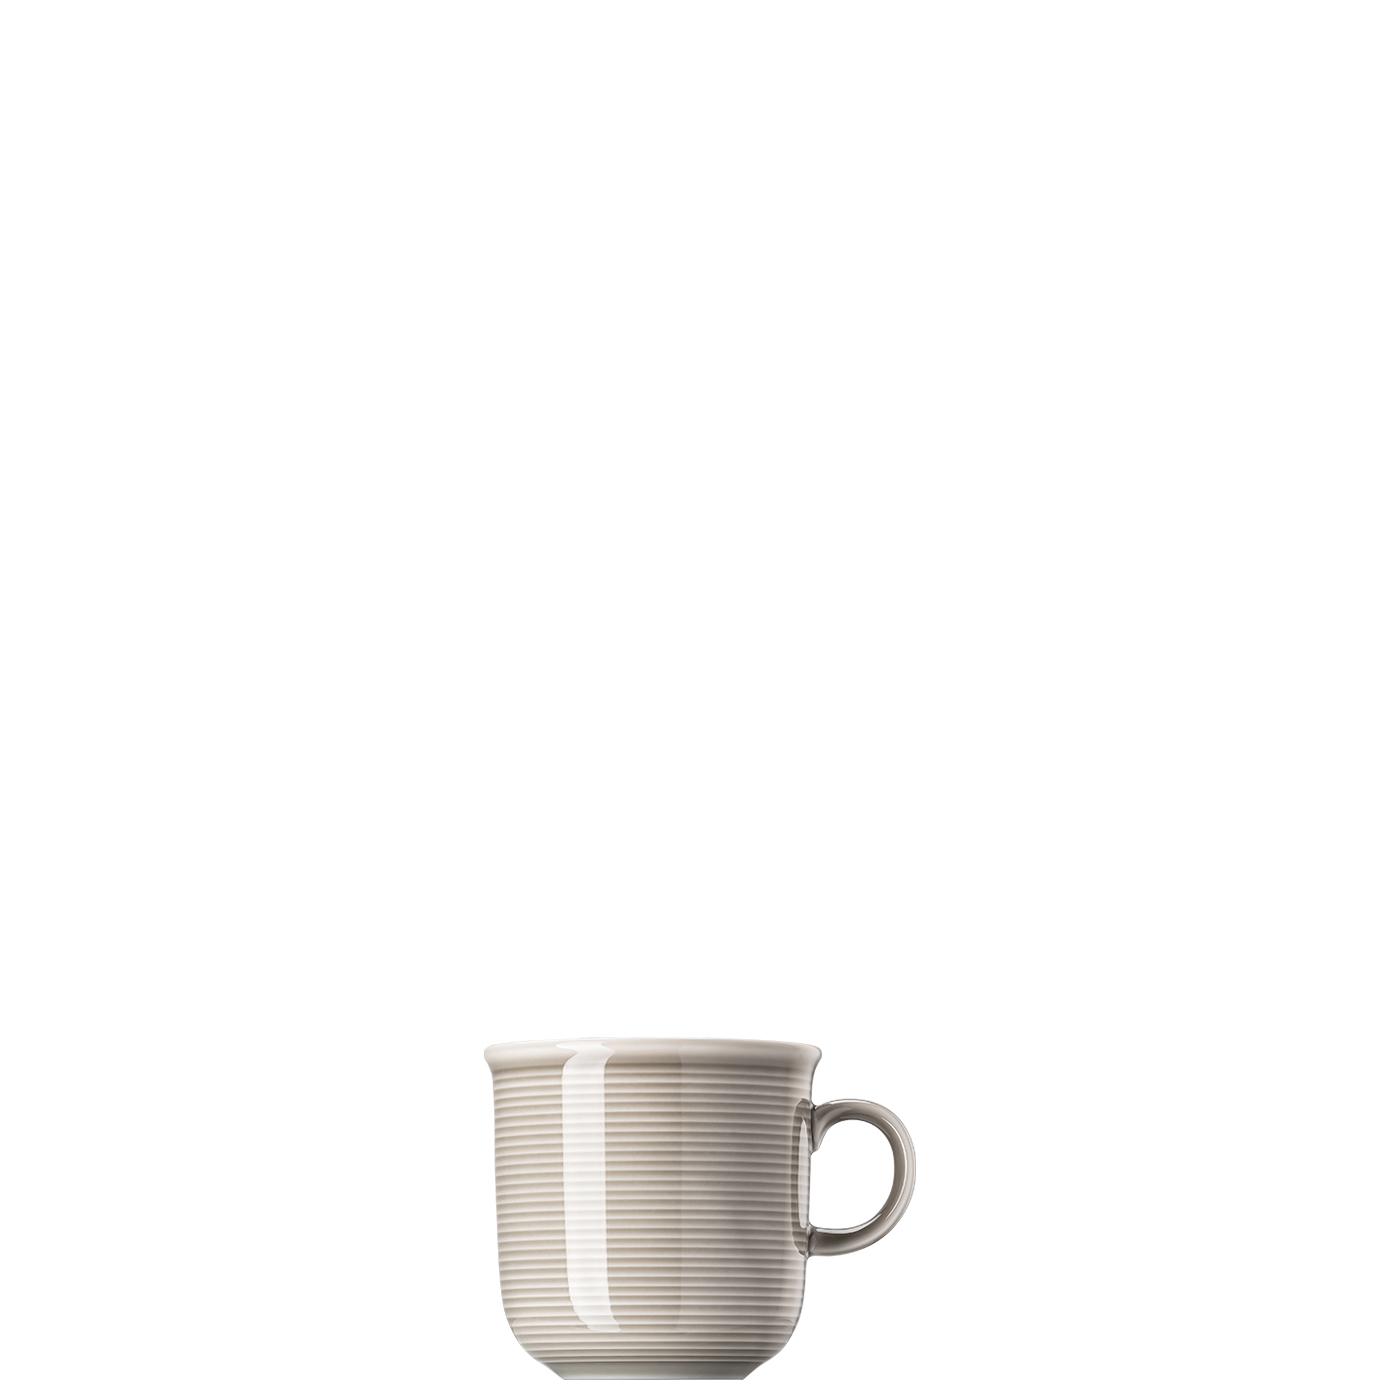 Becher mit Henkel Trend Colour Moon Grey Thomas Porzellan